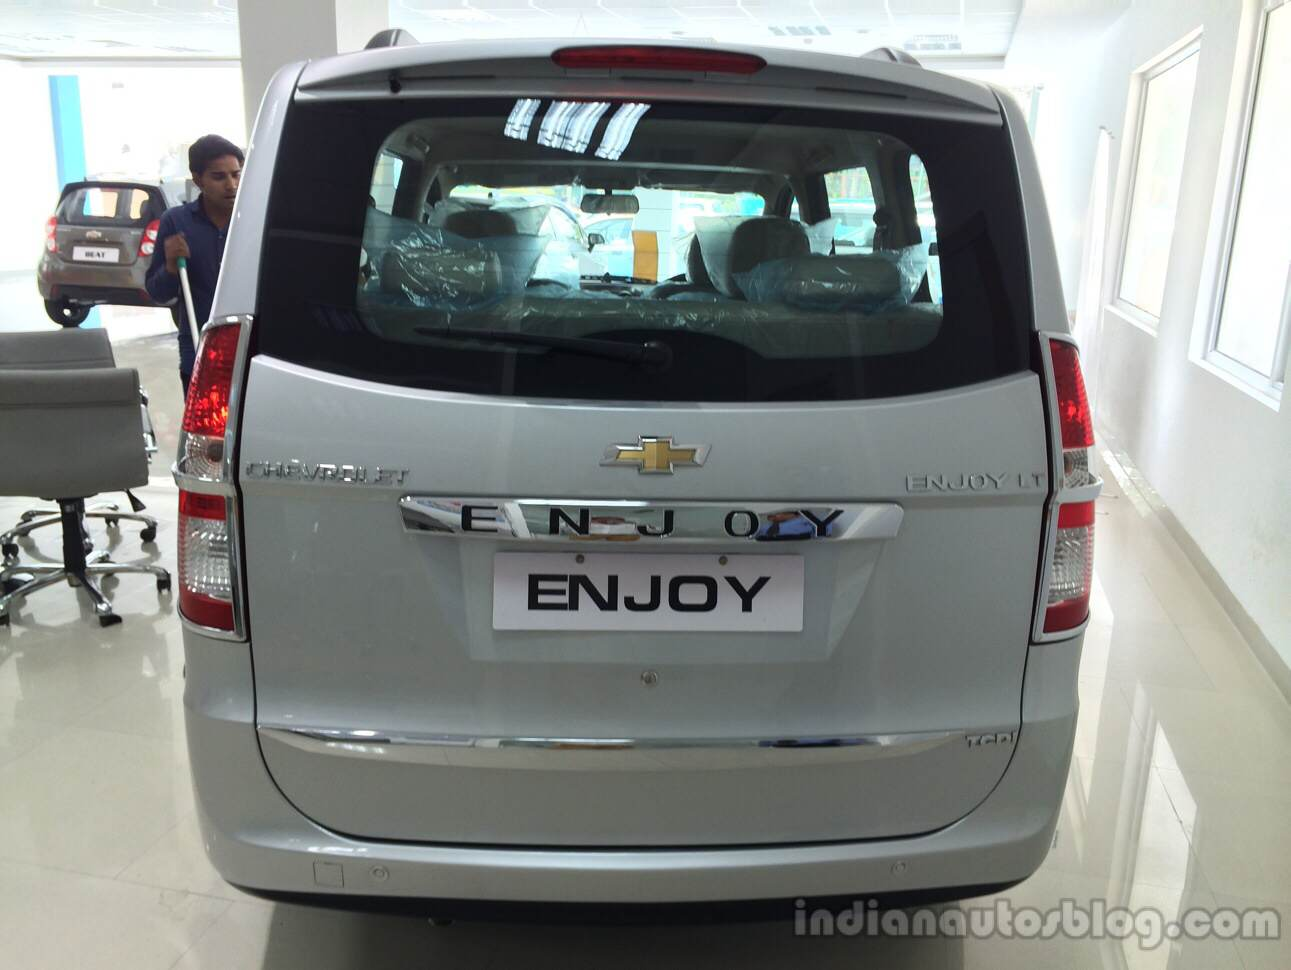 Chevrolet Enjoy 1st Anniversary Edition rear